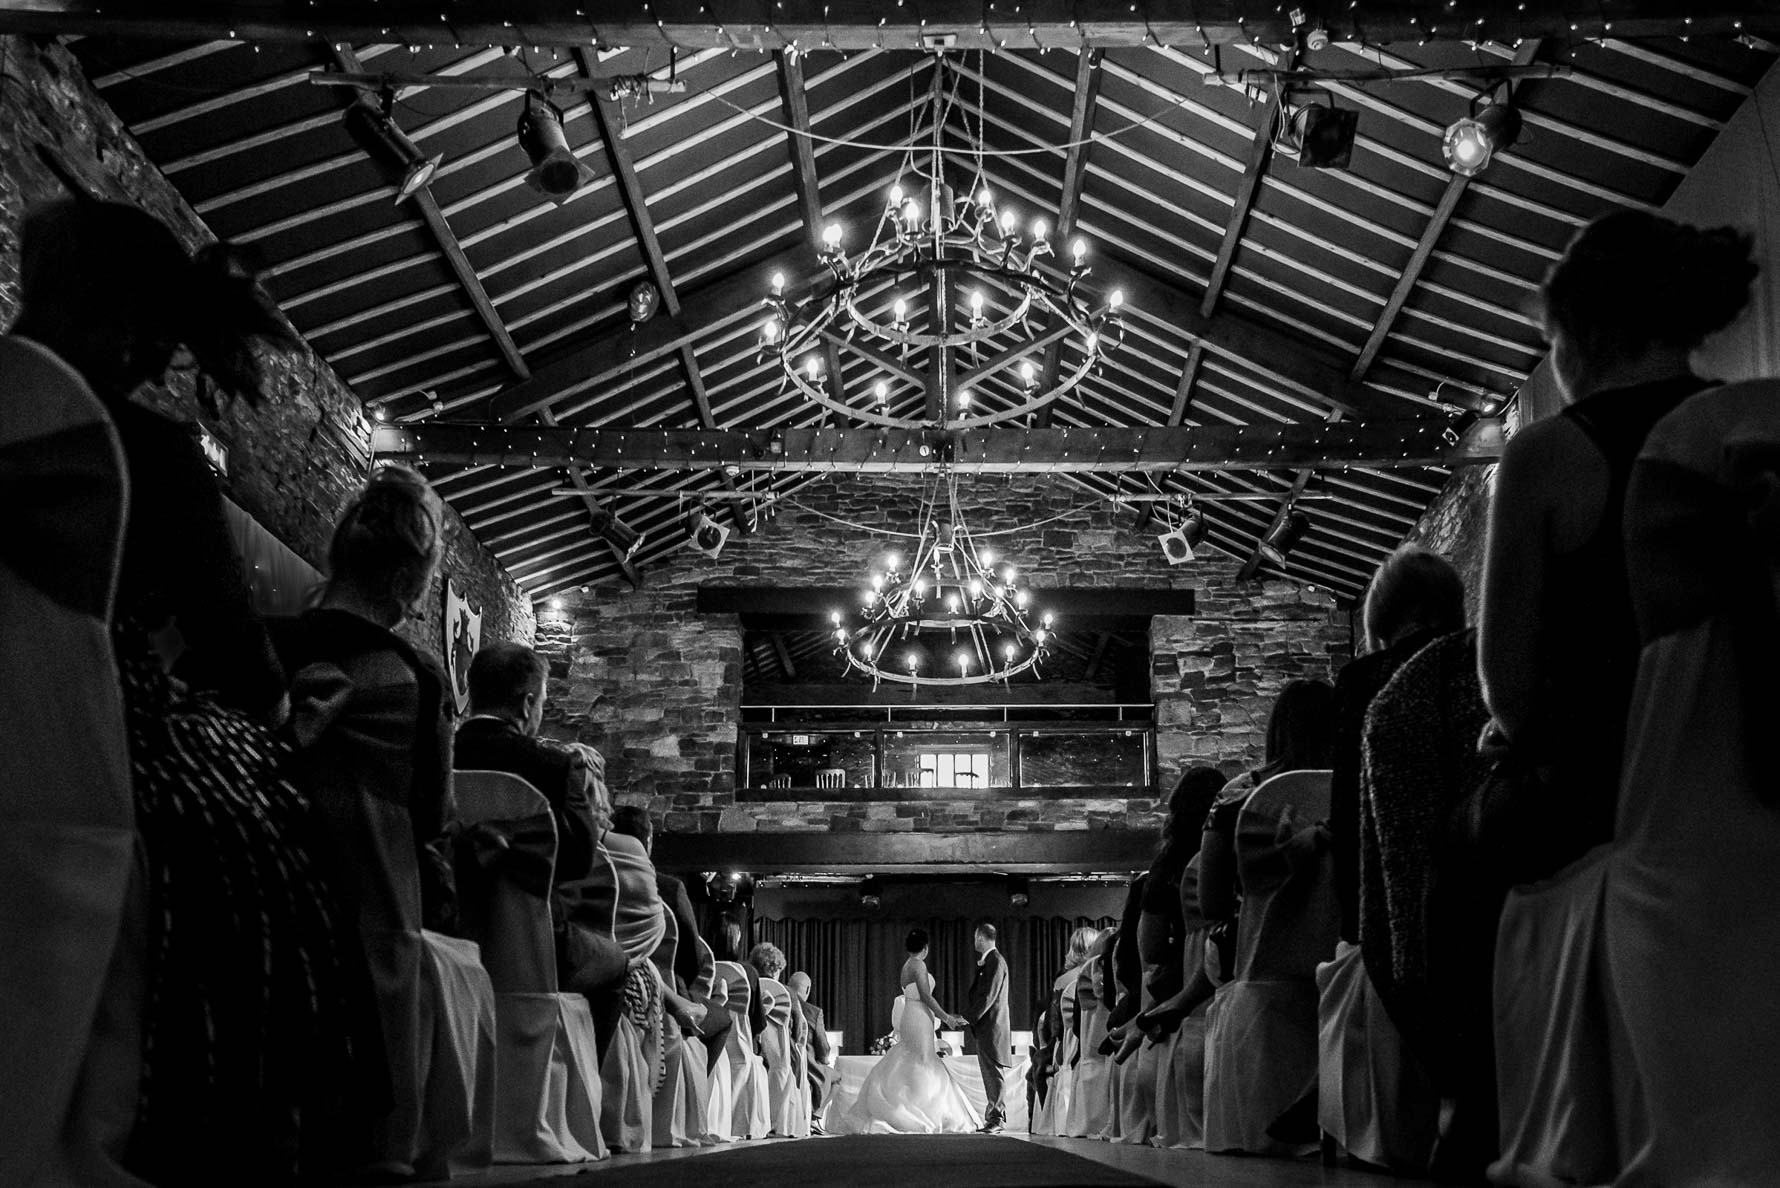 Couple exchange vows in medieval venue